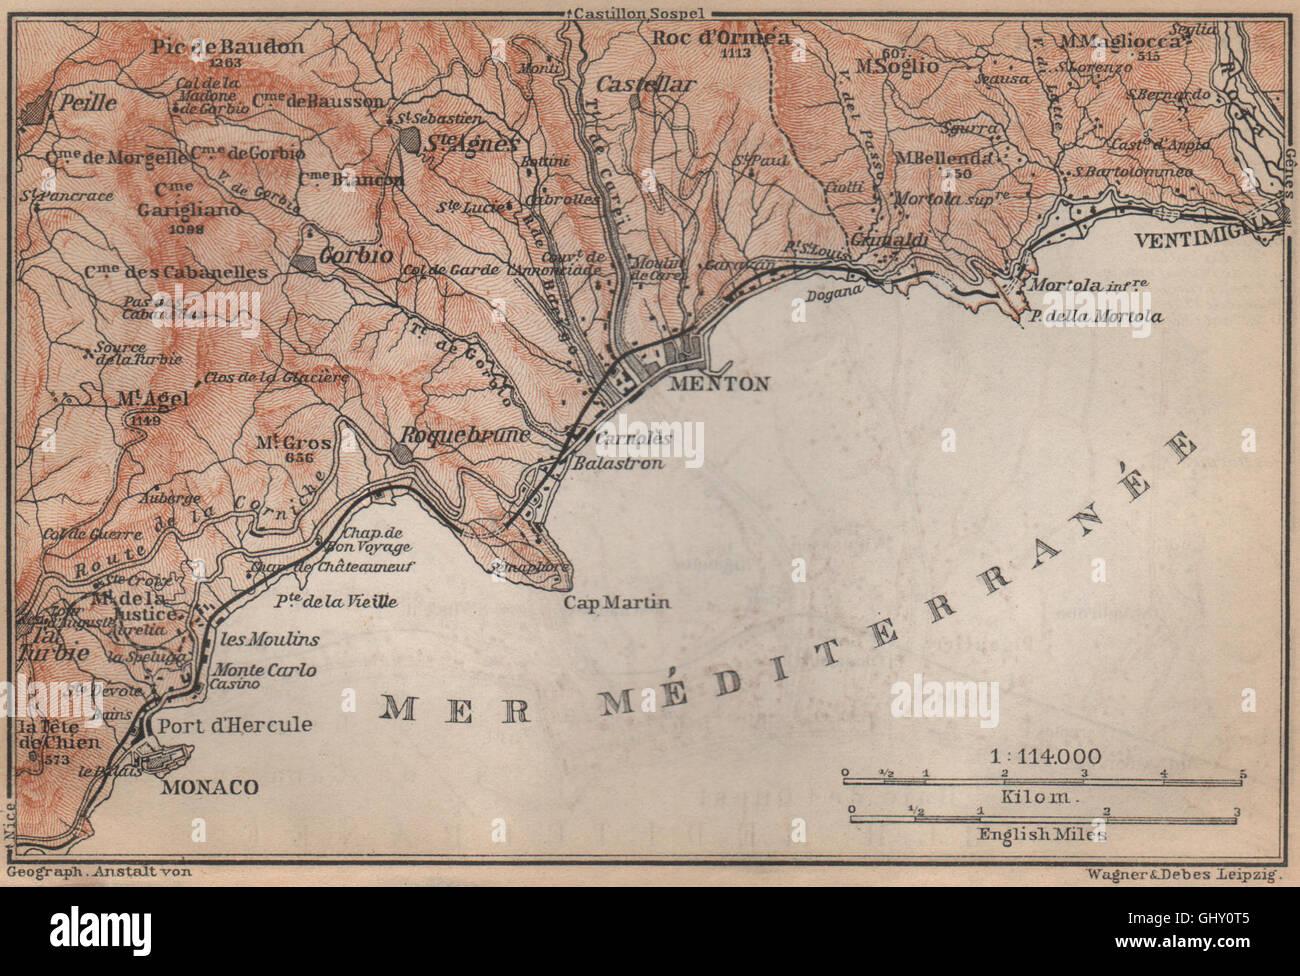 Monaco Italien Karte.Map Of Monaco Stockfotos Map Of Monaco Bilder Alamy